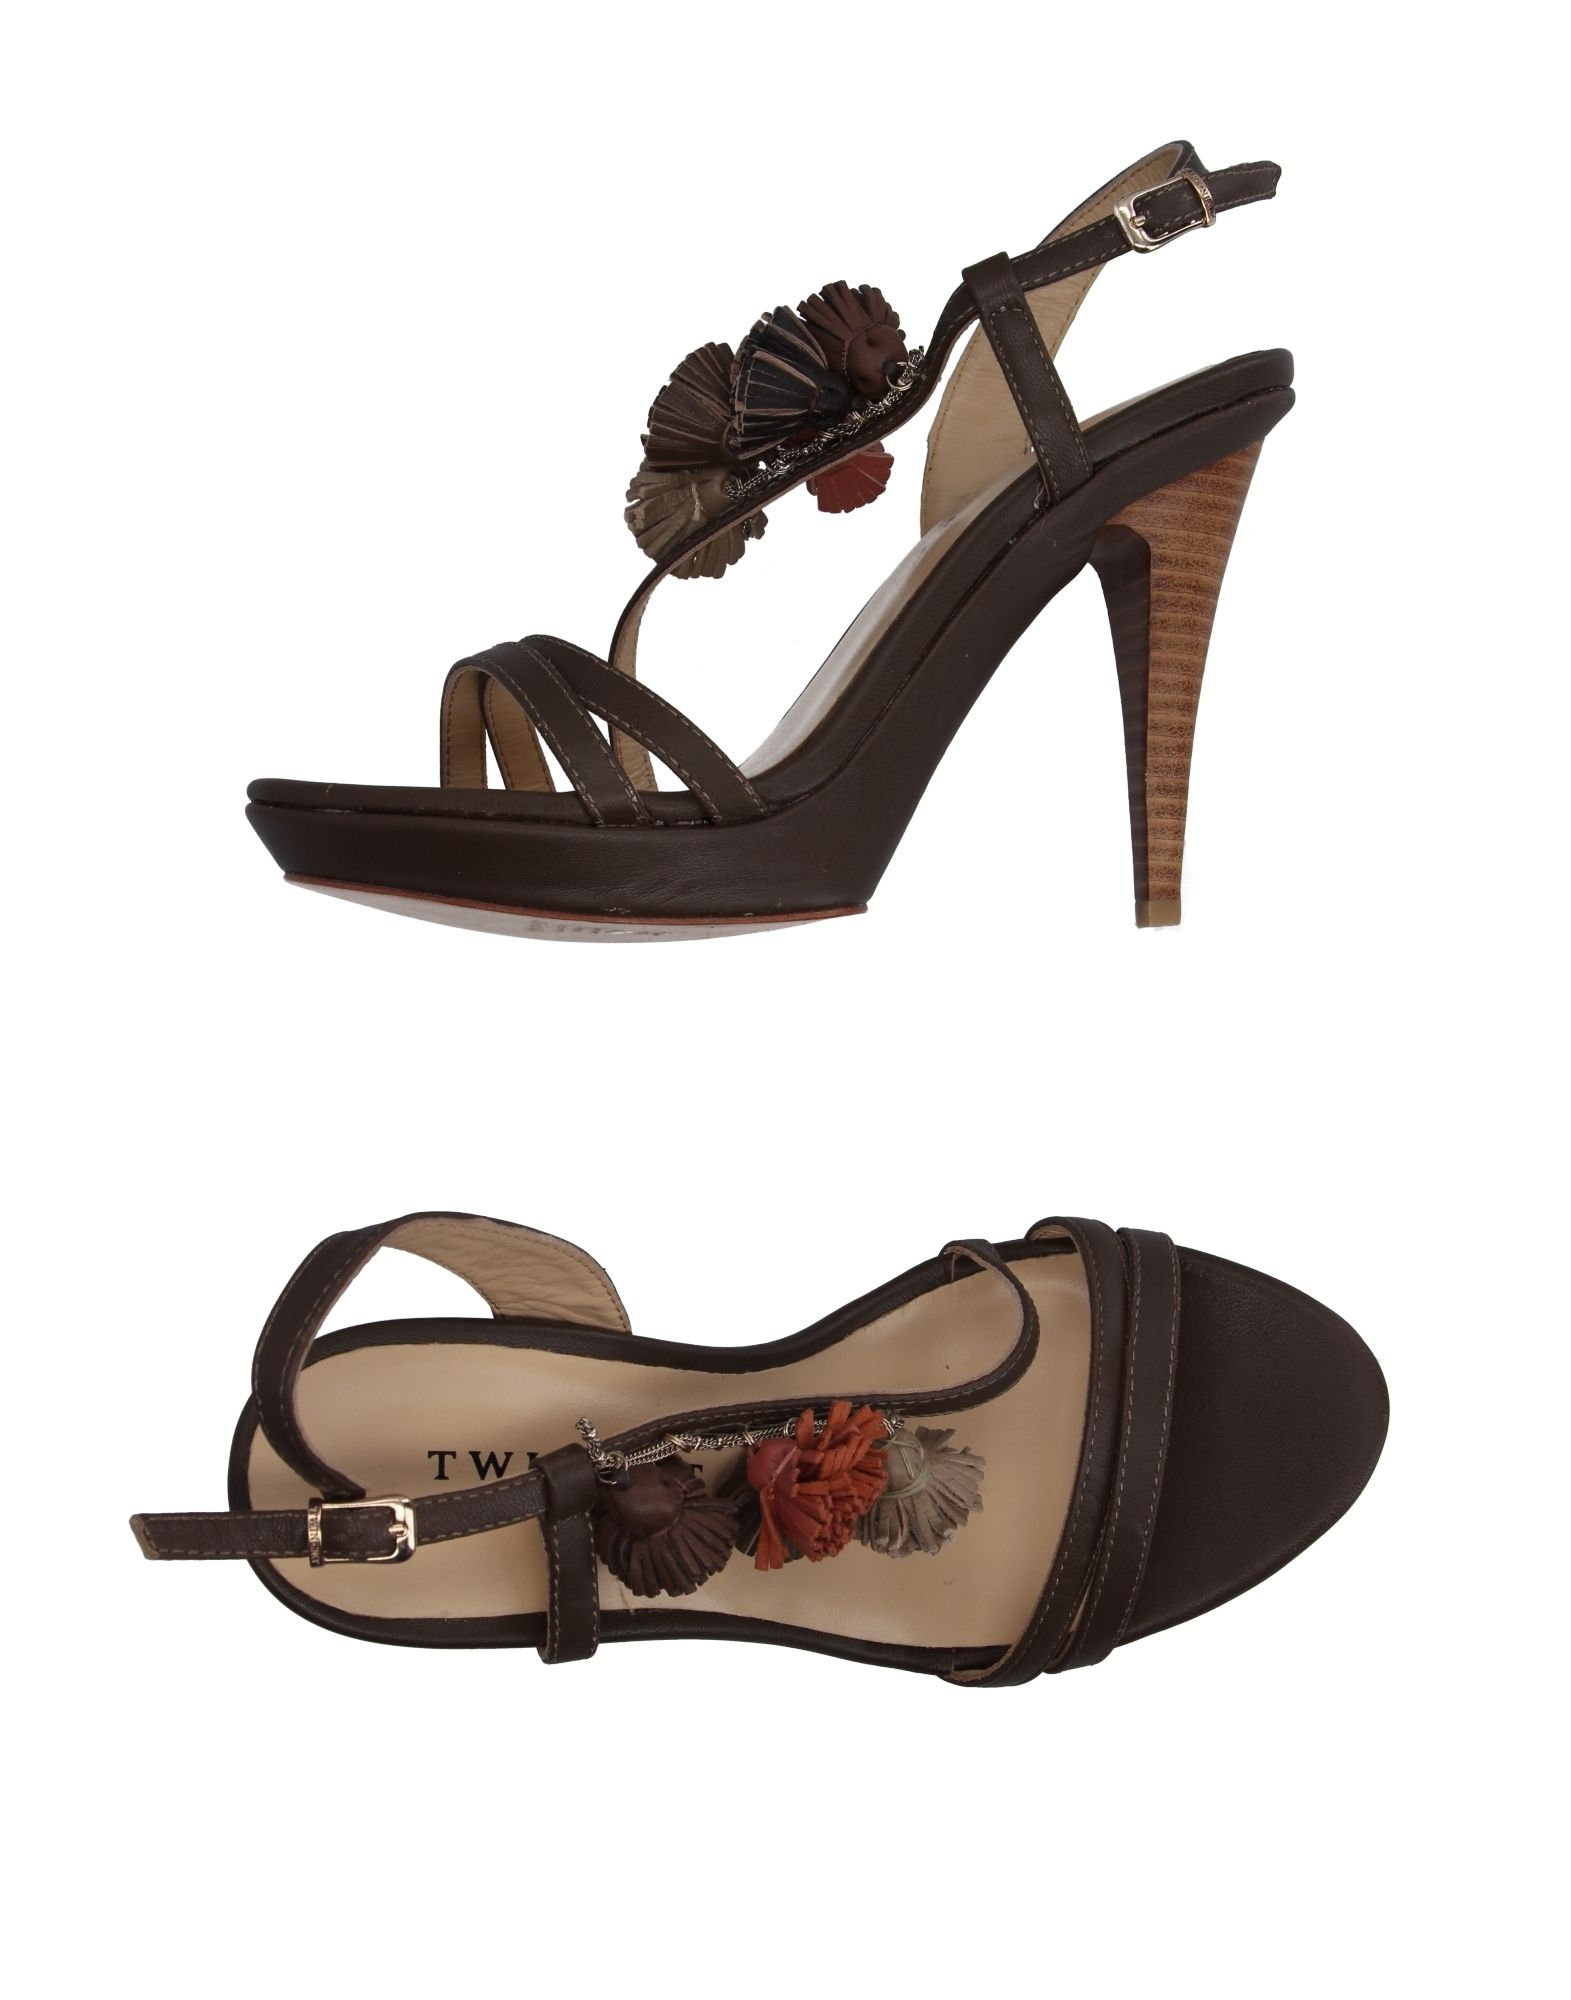 Sandales Twin-Set Simona Barbieri Femme - Sandales Twin-Set Simona Barbieri sur